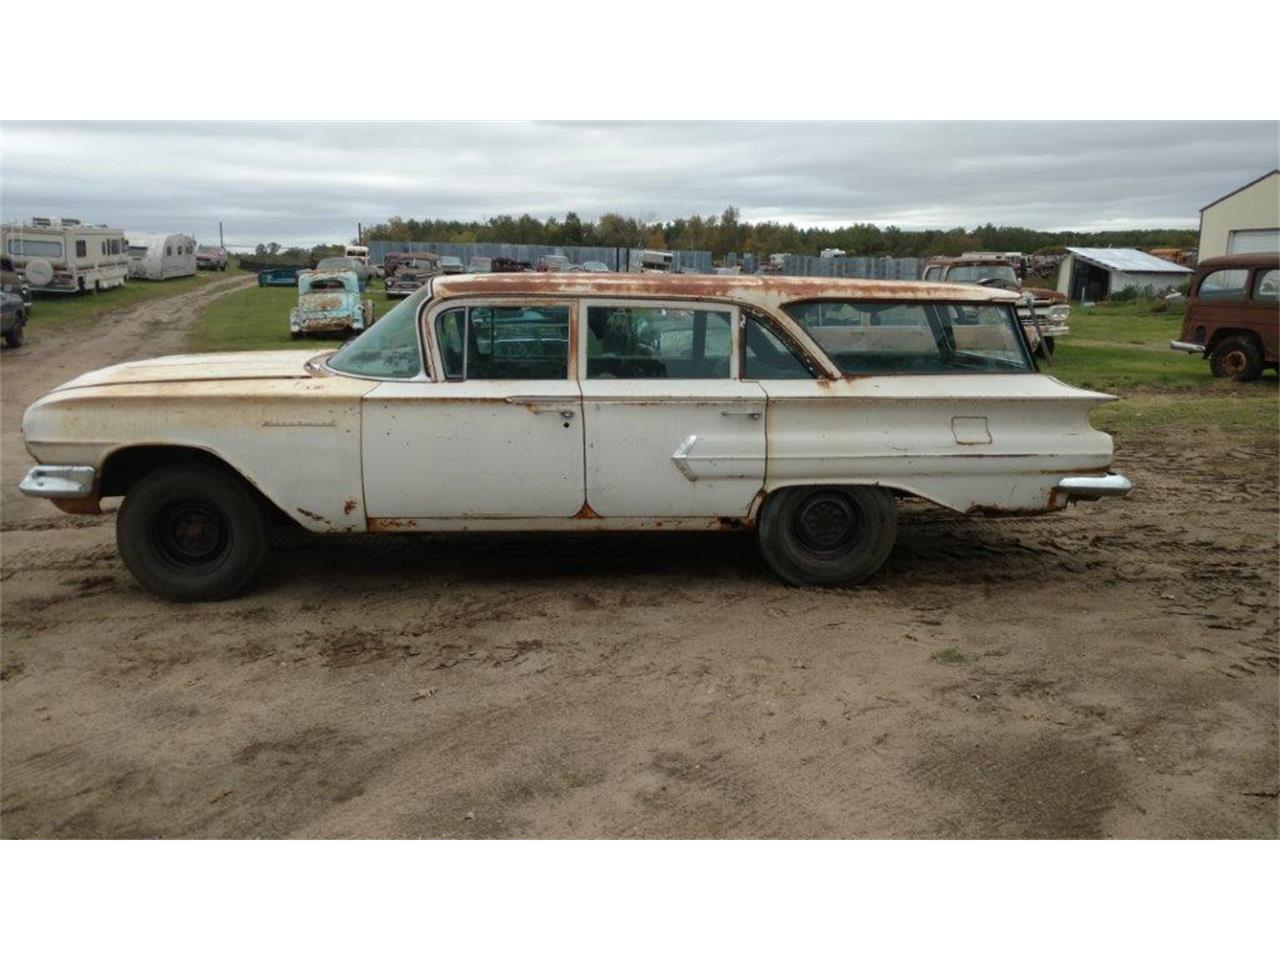 1960 Chevrolet Station Wagon For Sale Classiccars Com Cc 1023004